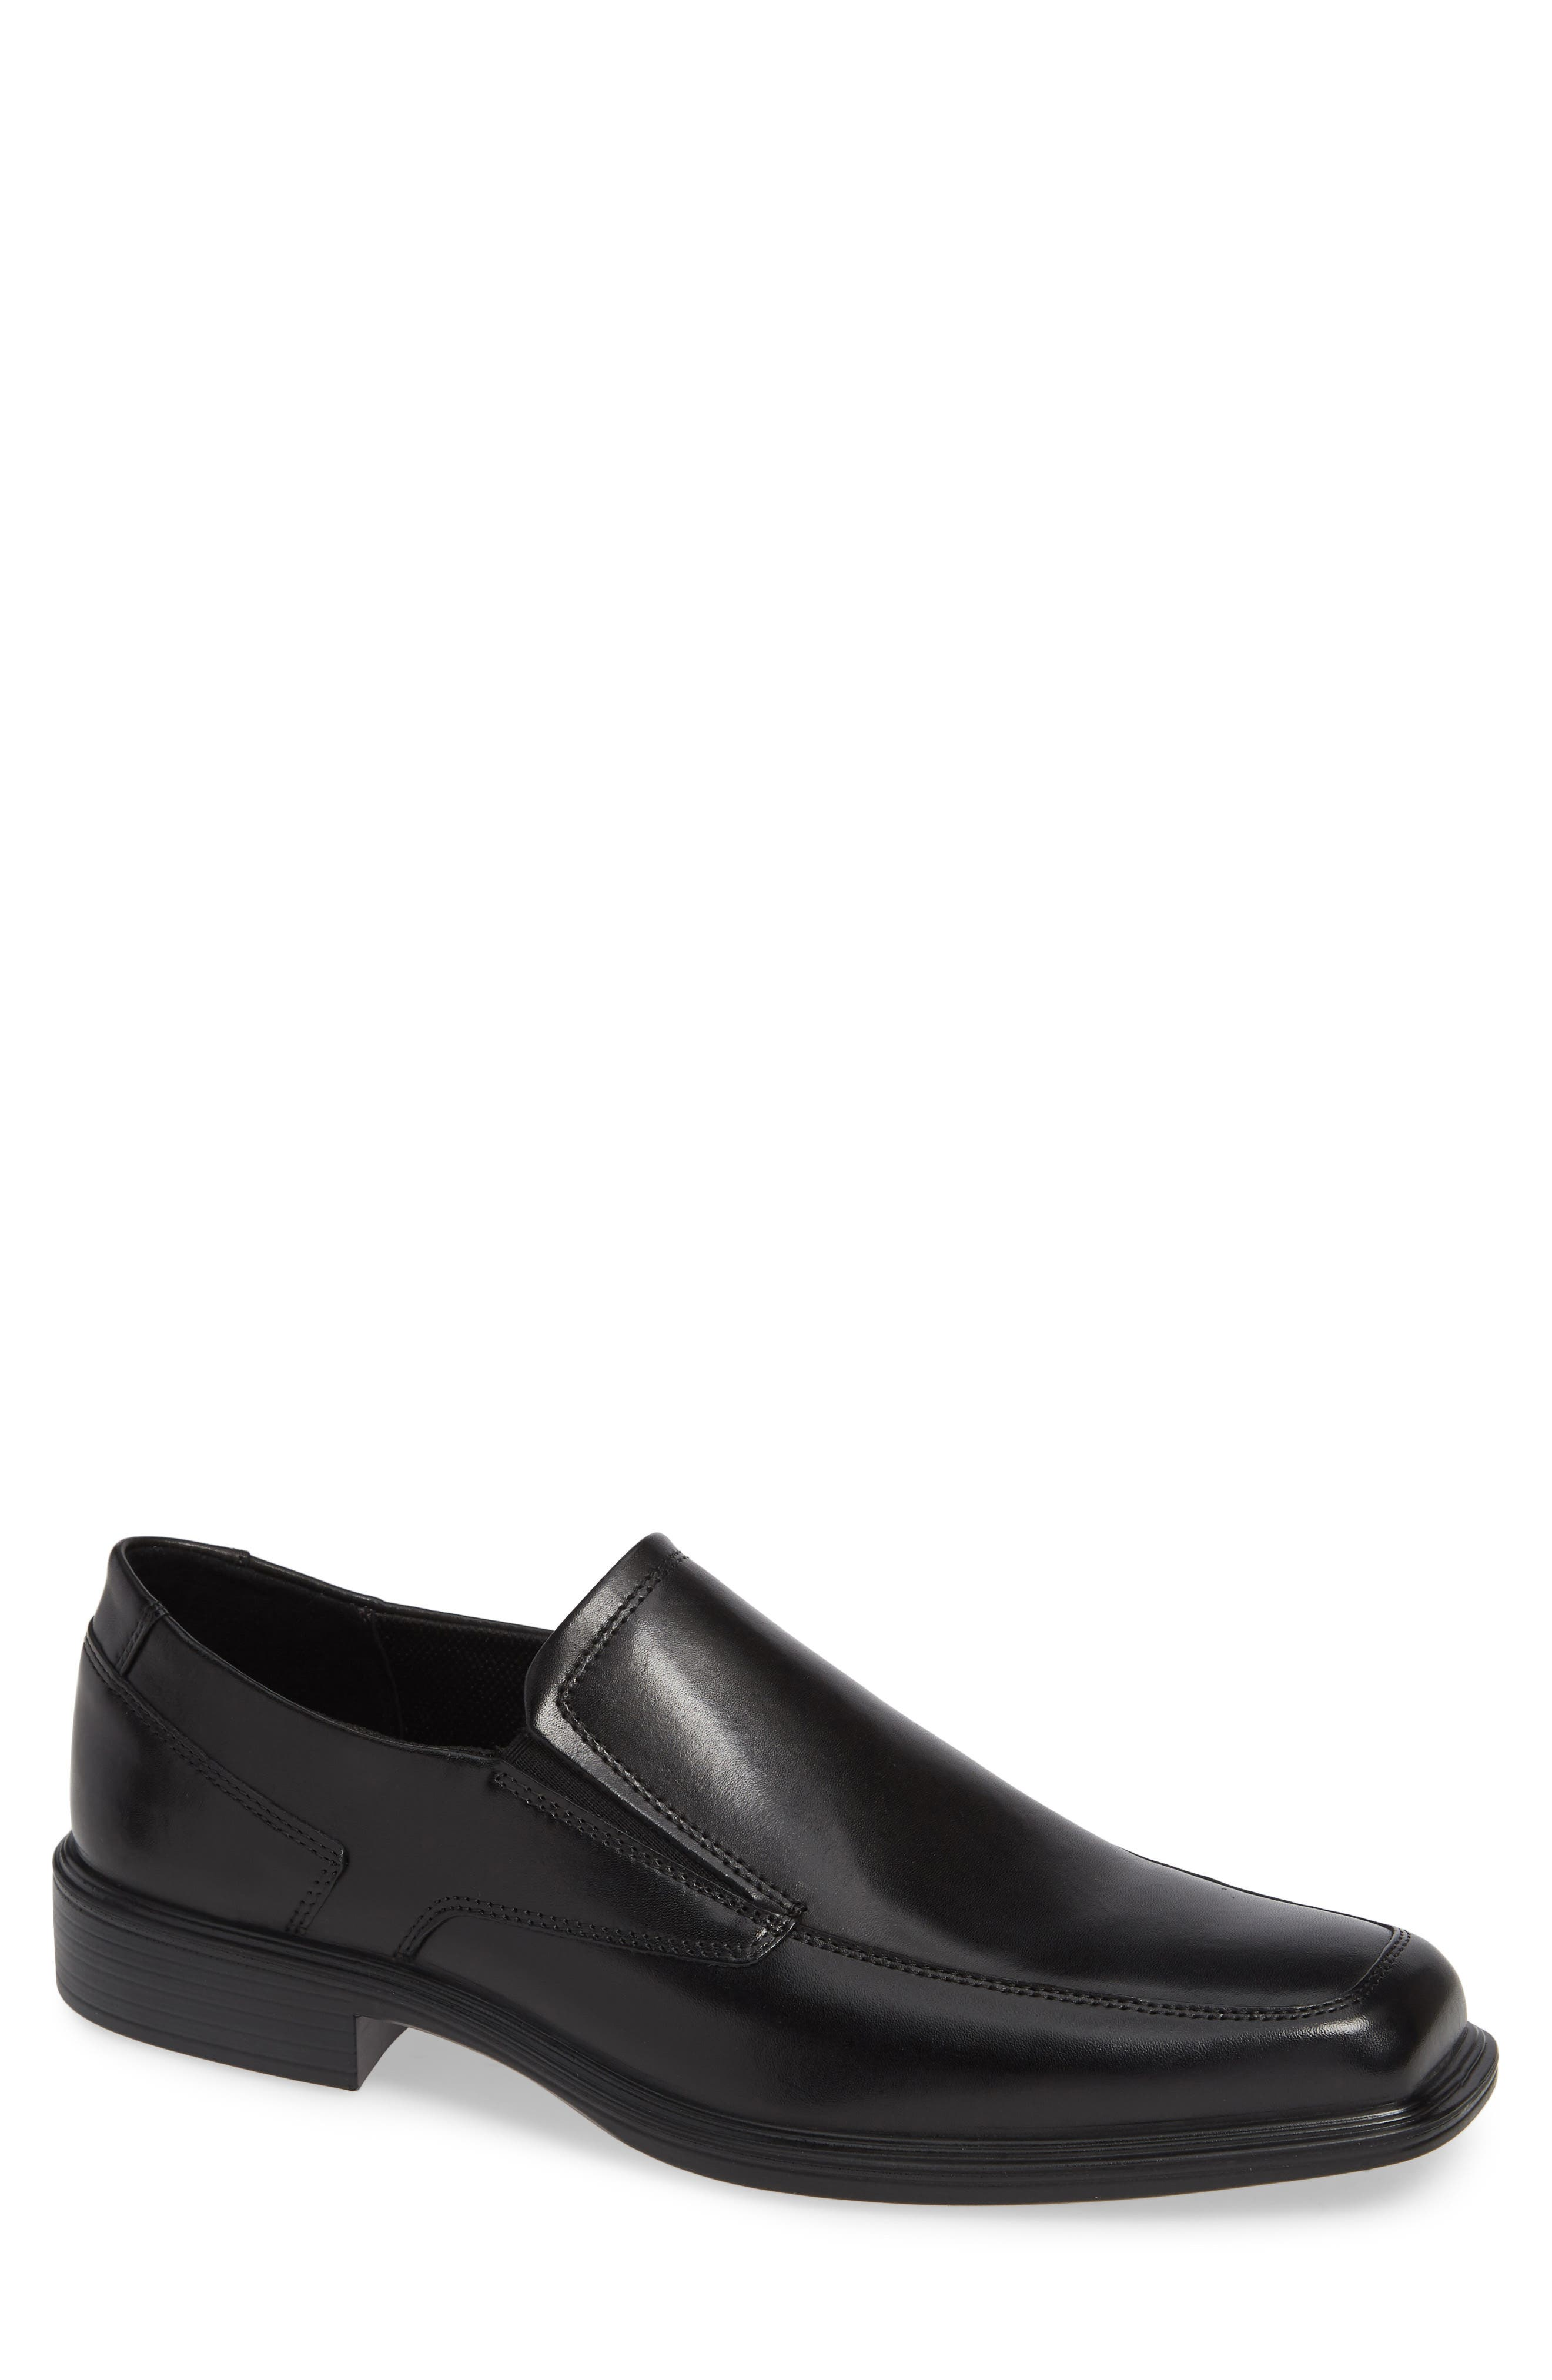 Minneapolis Venetian Loafer,                             Main thumbnail 1, color,                             BLACK/BLACK LEATHER